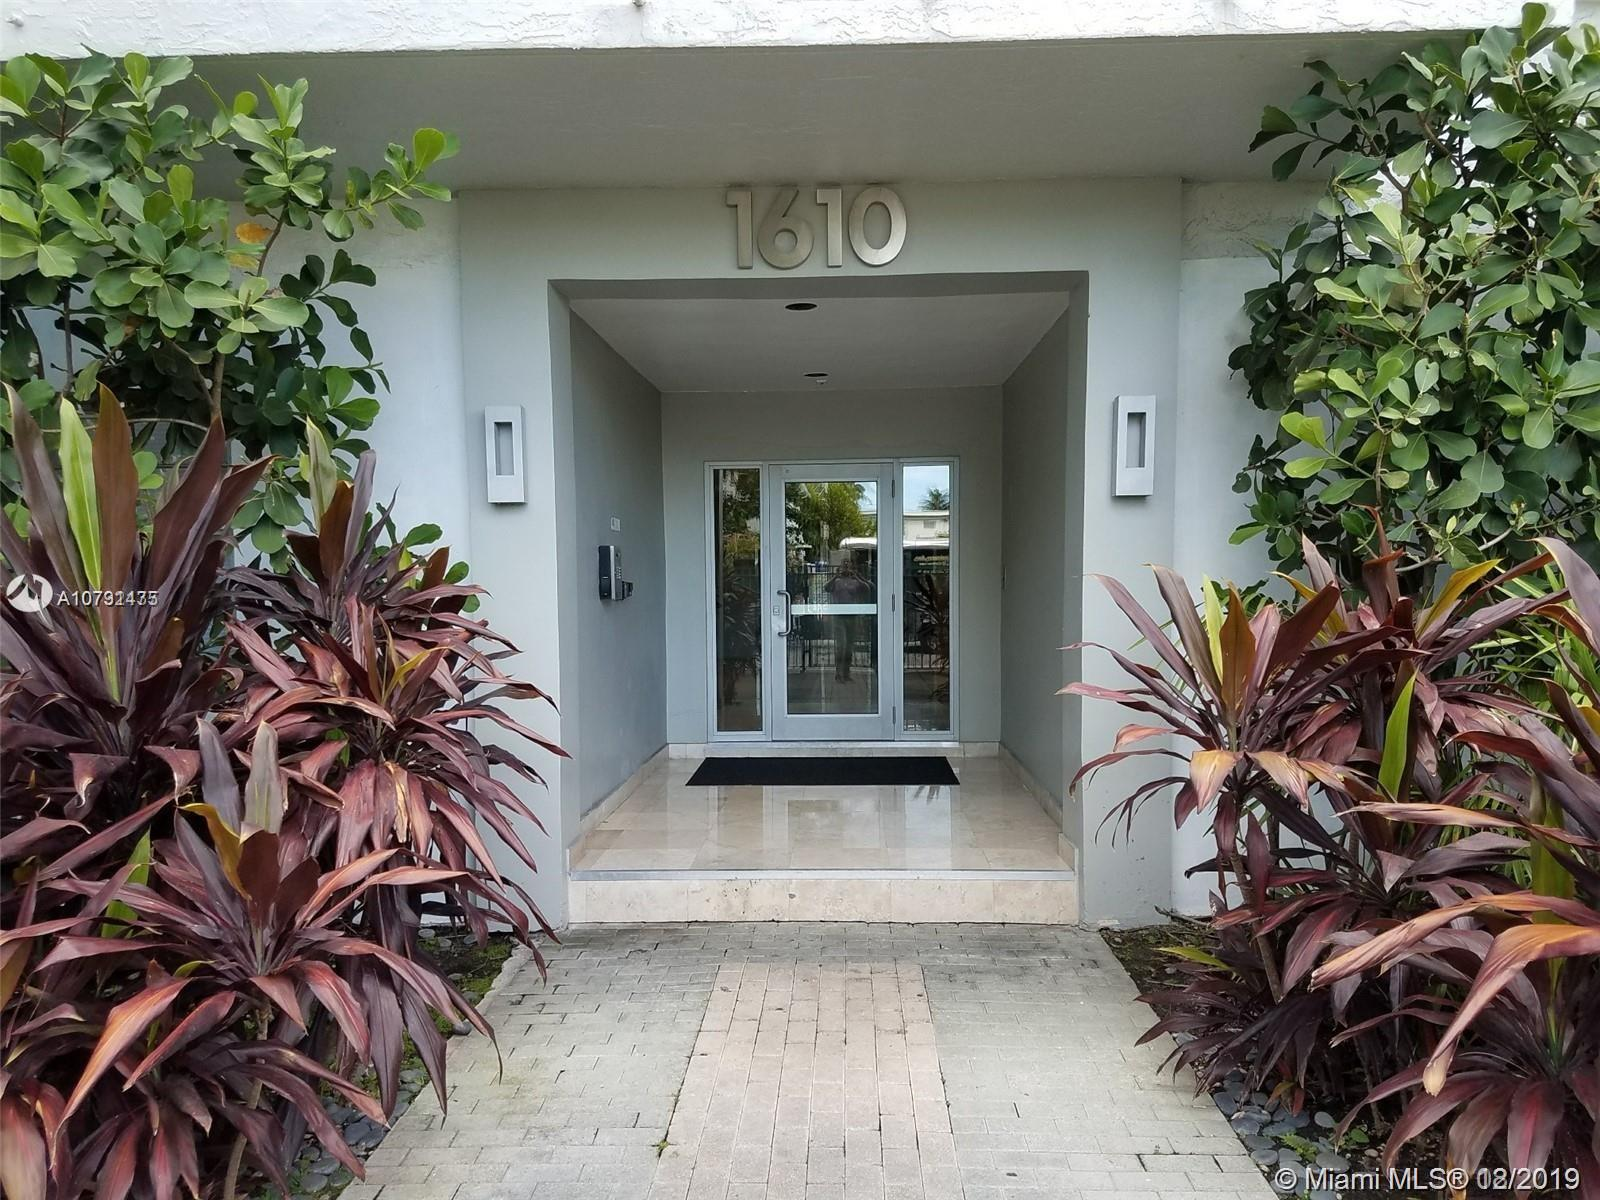 1610 Lenox Ave # 203, Miami Beach, Florida 33139, 1 Bedroom Bedrooms, ,2 BathroomsBathrooms,Residential,For Sale,1610 Lenox Ave # 203,A10791475